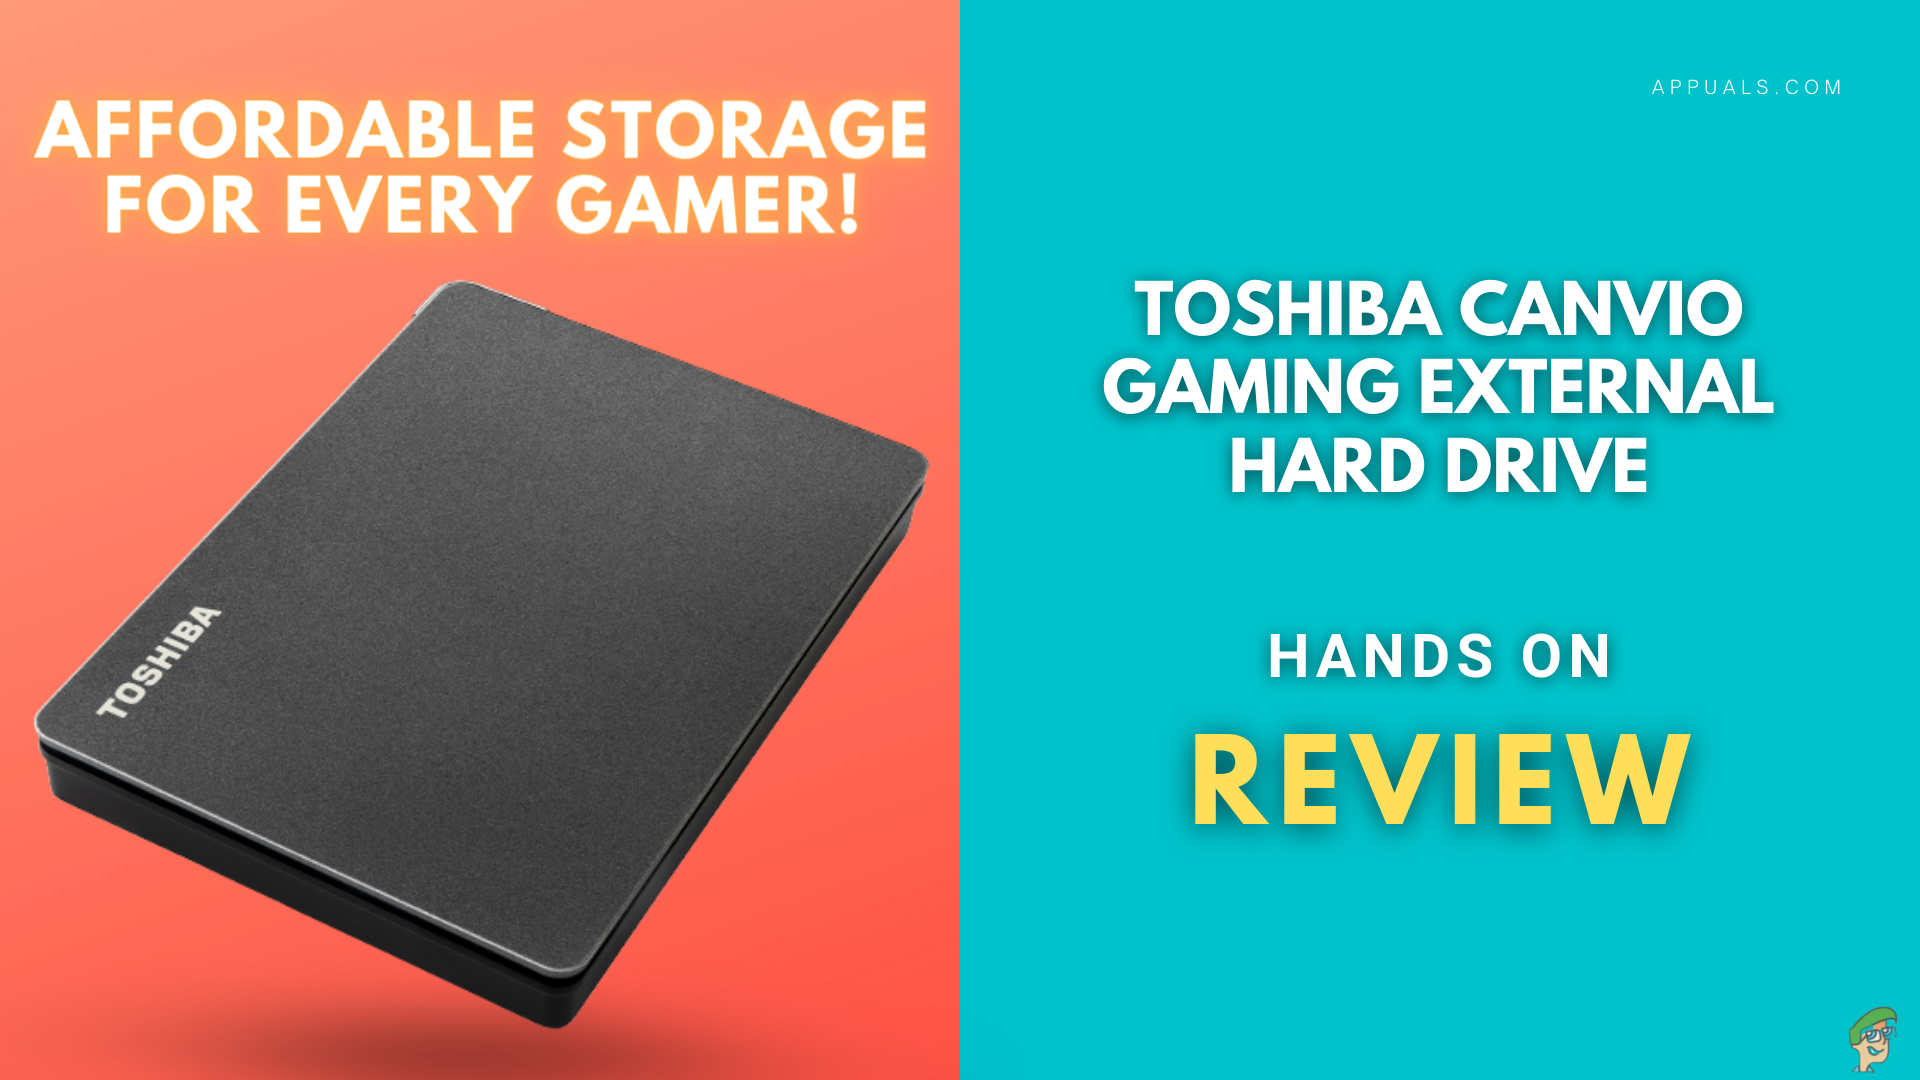 Toshiba Canvio Gaming Review